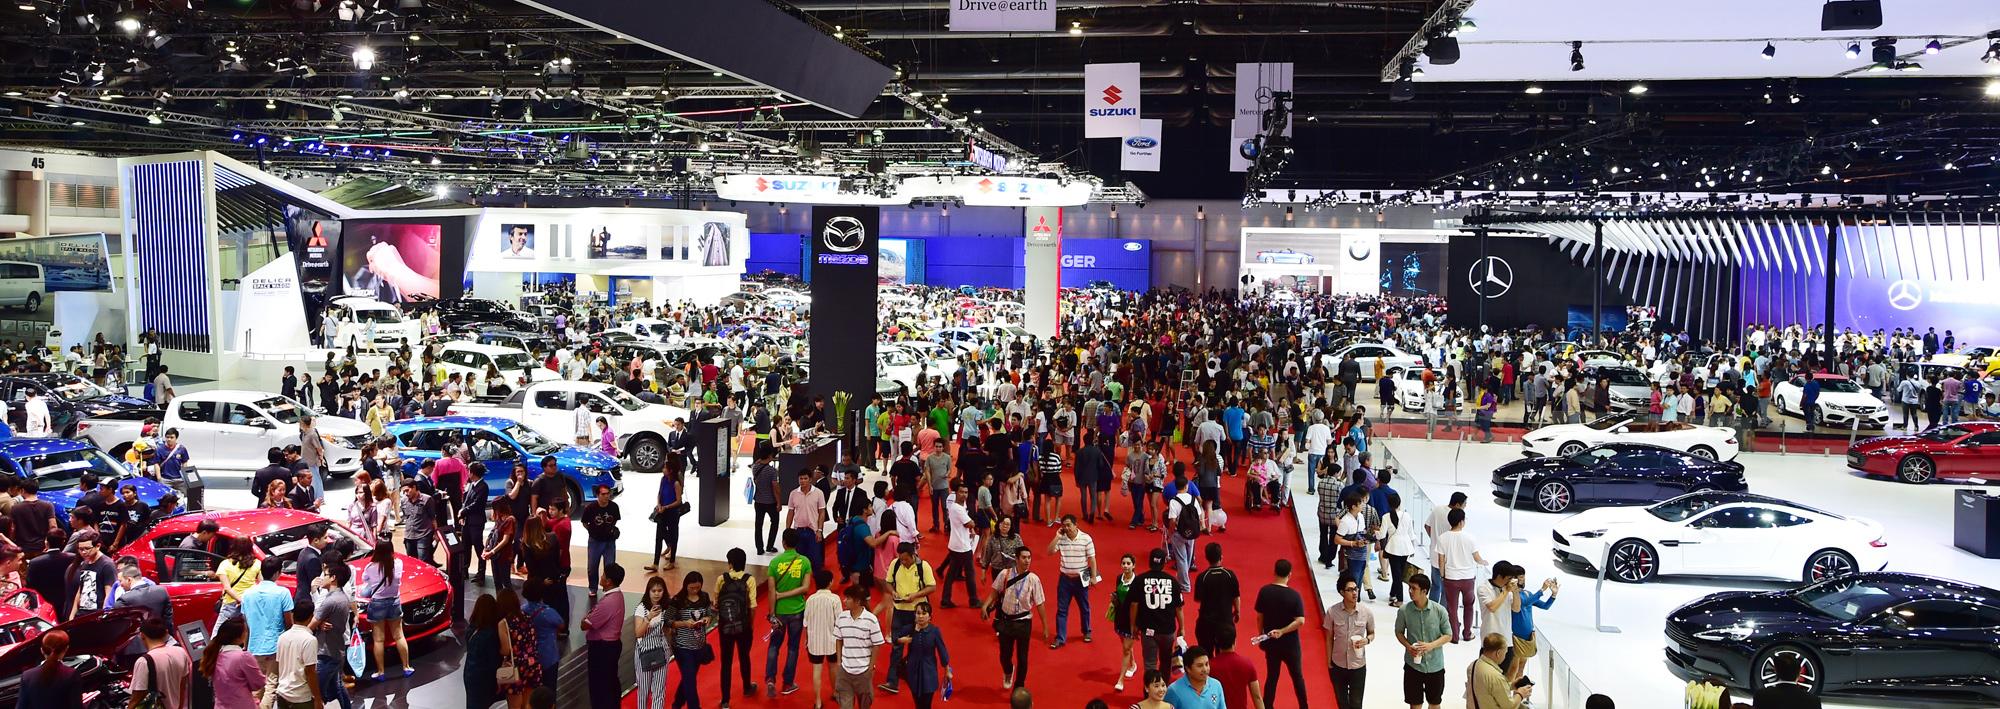 37th-bangkok-international-motor-show